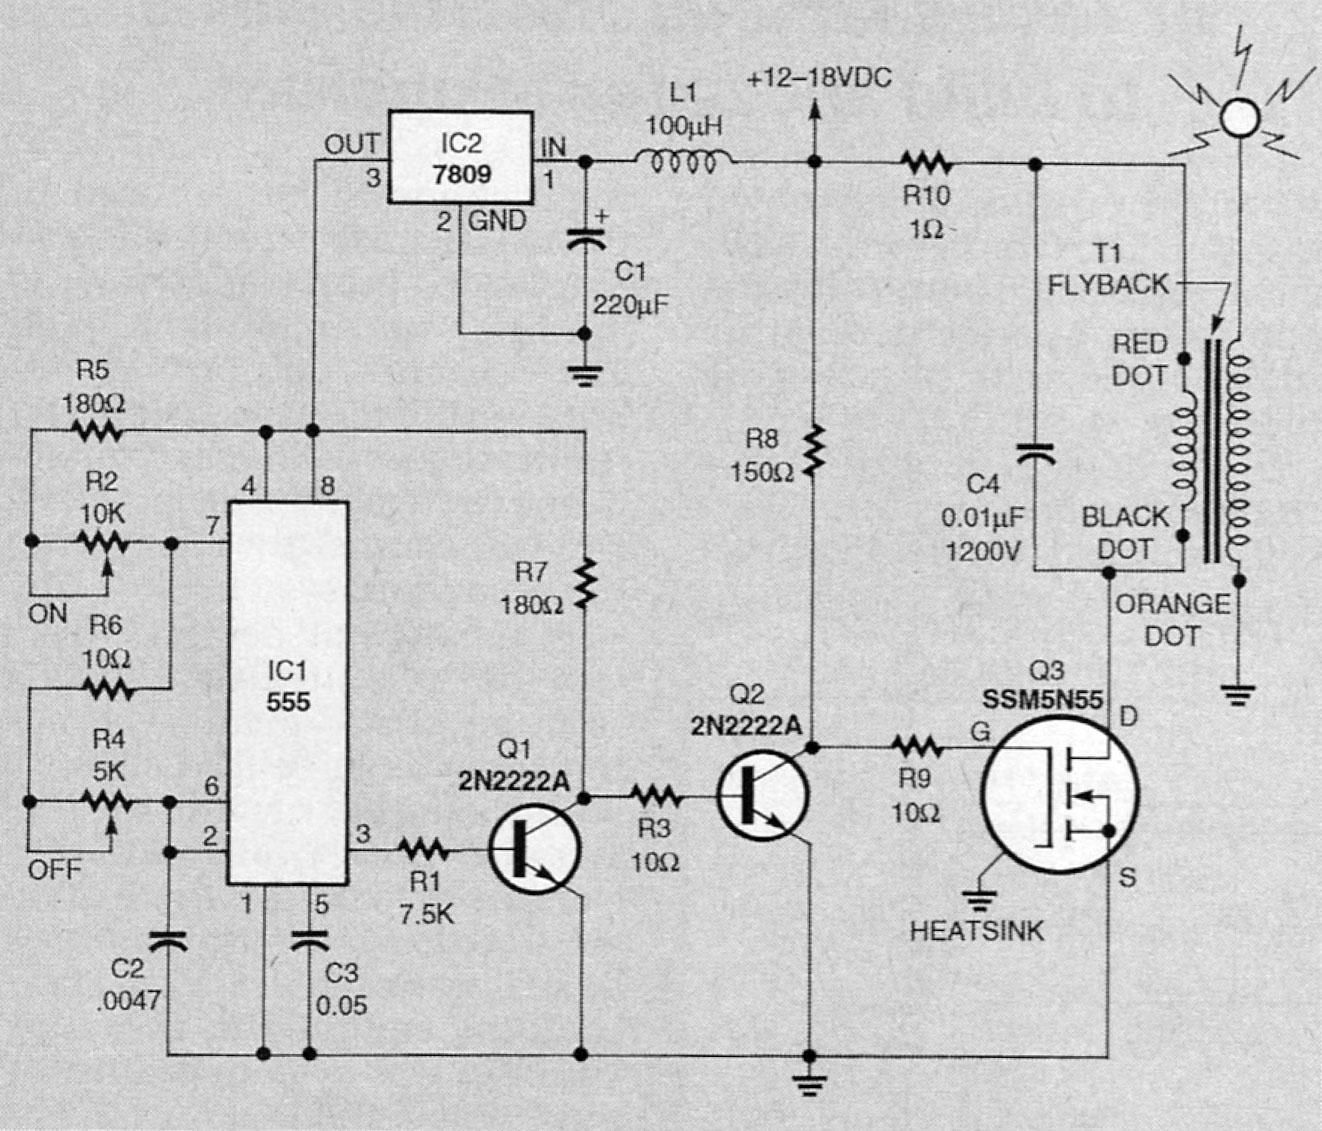 medium resolution of stun gun circuit diagram furthermore high voltage generator circuit coil gun diagram furthermore high voltage power supply schematic